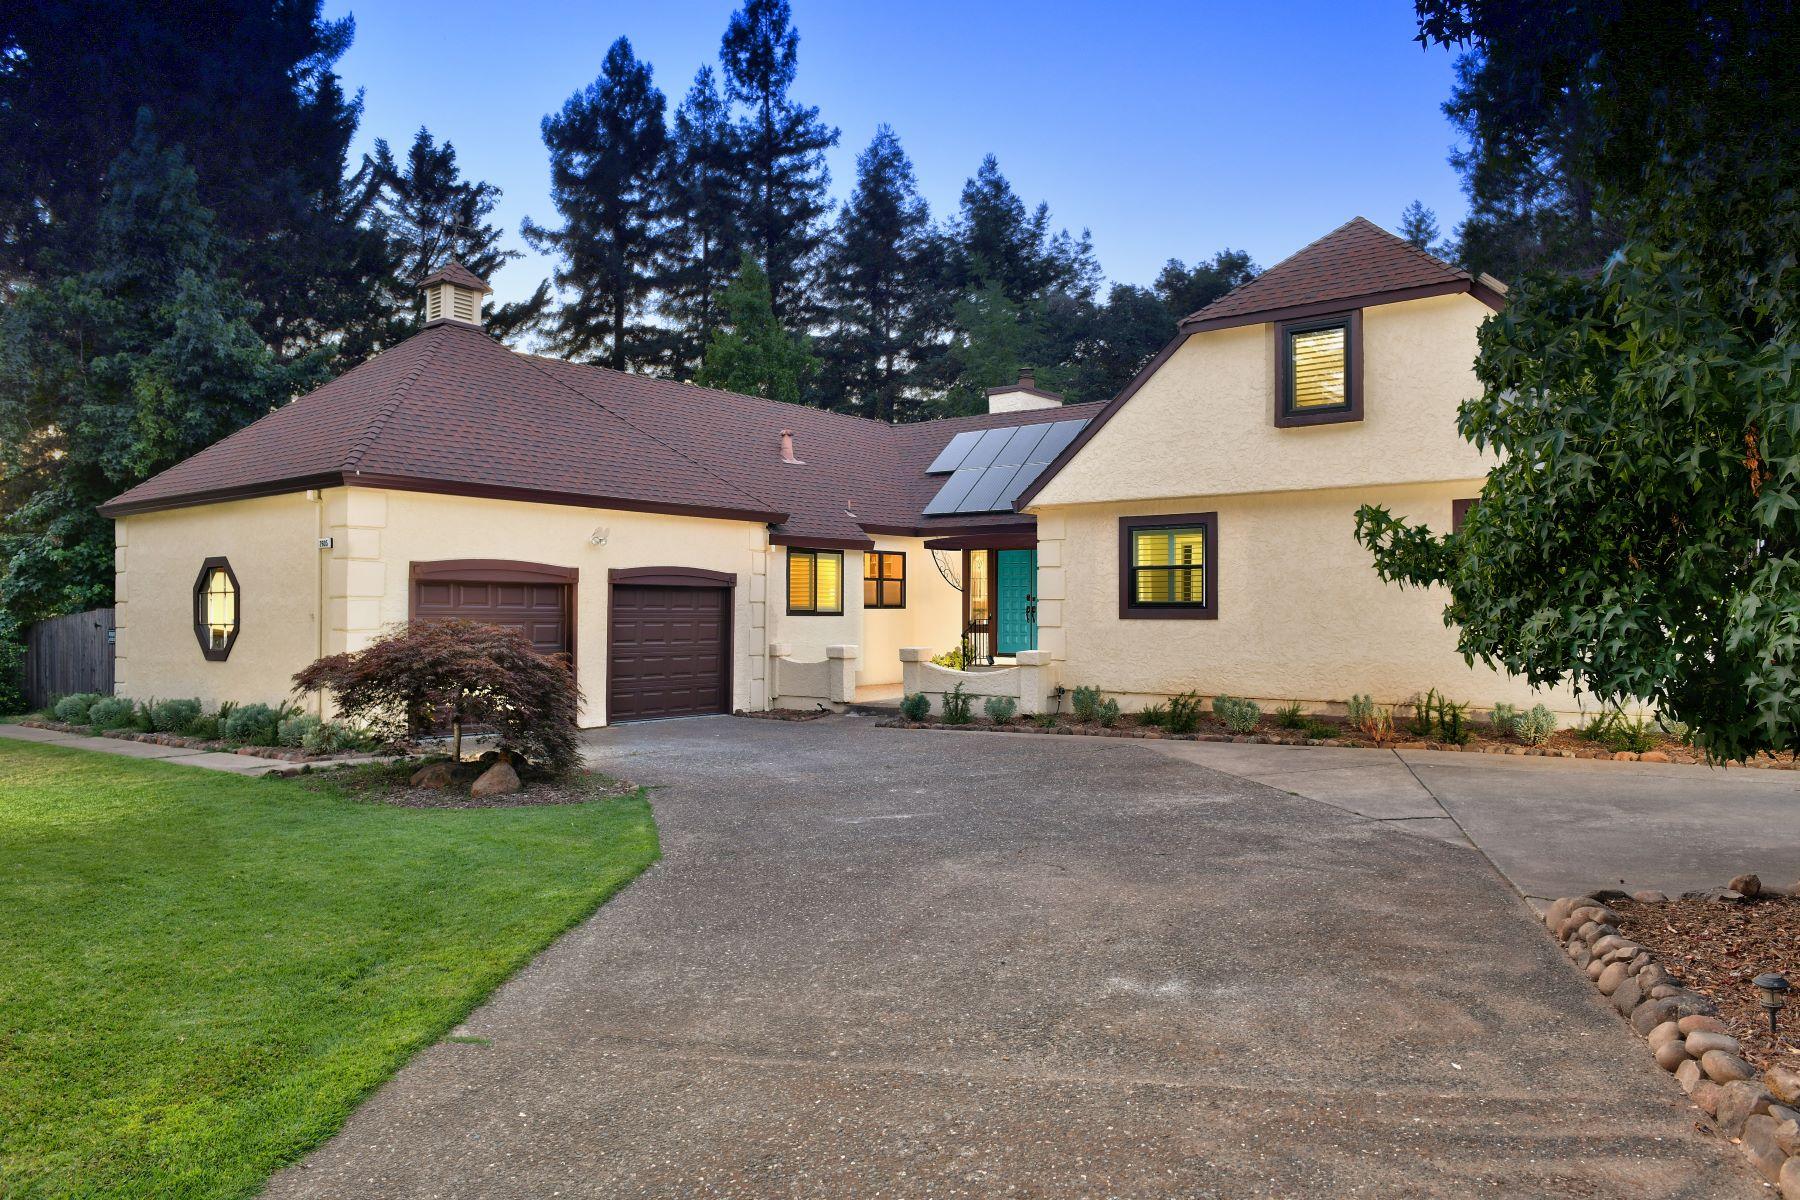 Single Family Homes for Sale at Elegant Knob Hill Tudor 2605 Knob Hill Drive Santa Rosa, California 95404 United States